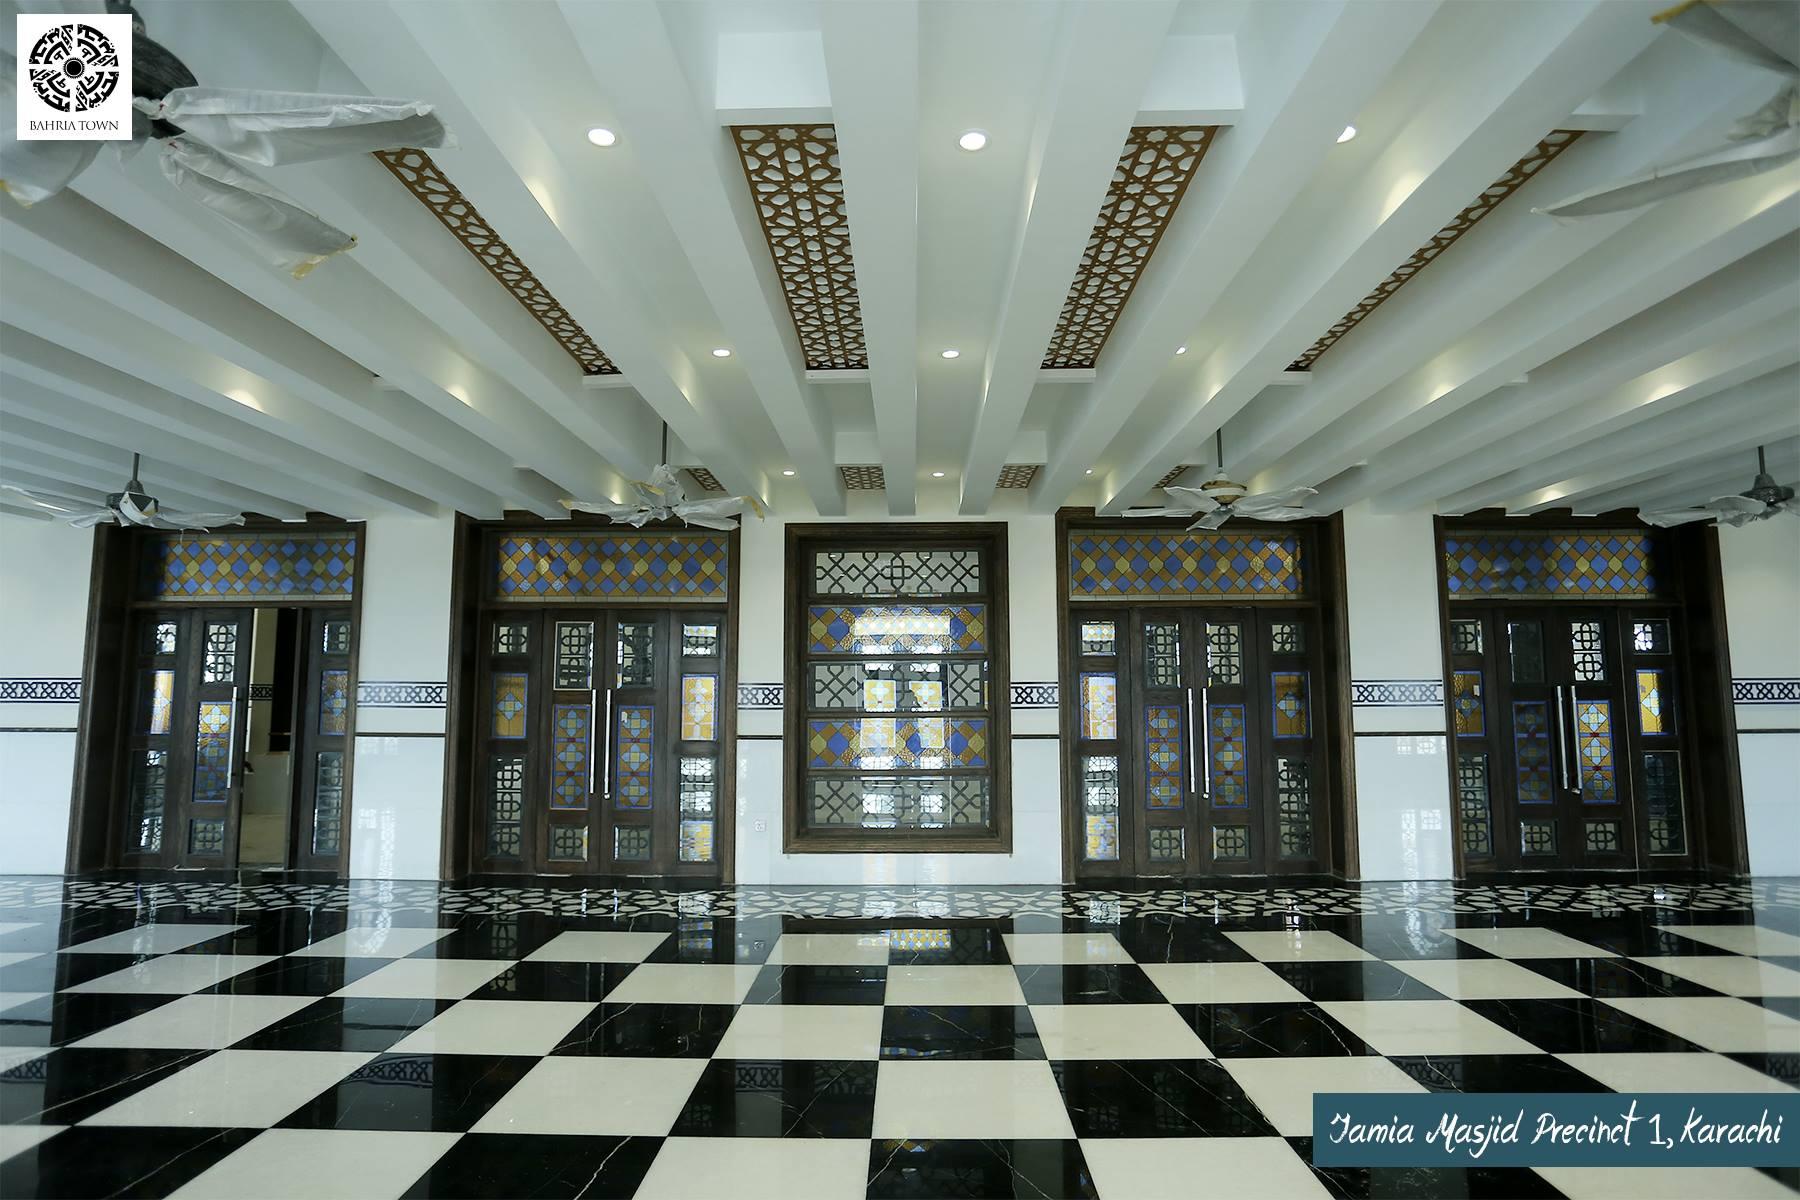 Jamia Masjid – Precinct 1 Bahria Town Karachi7